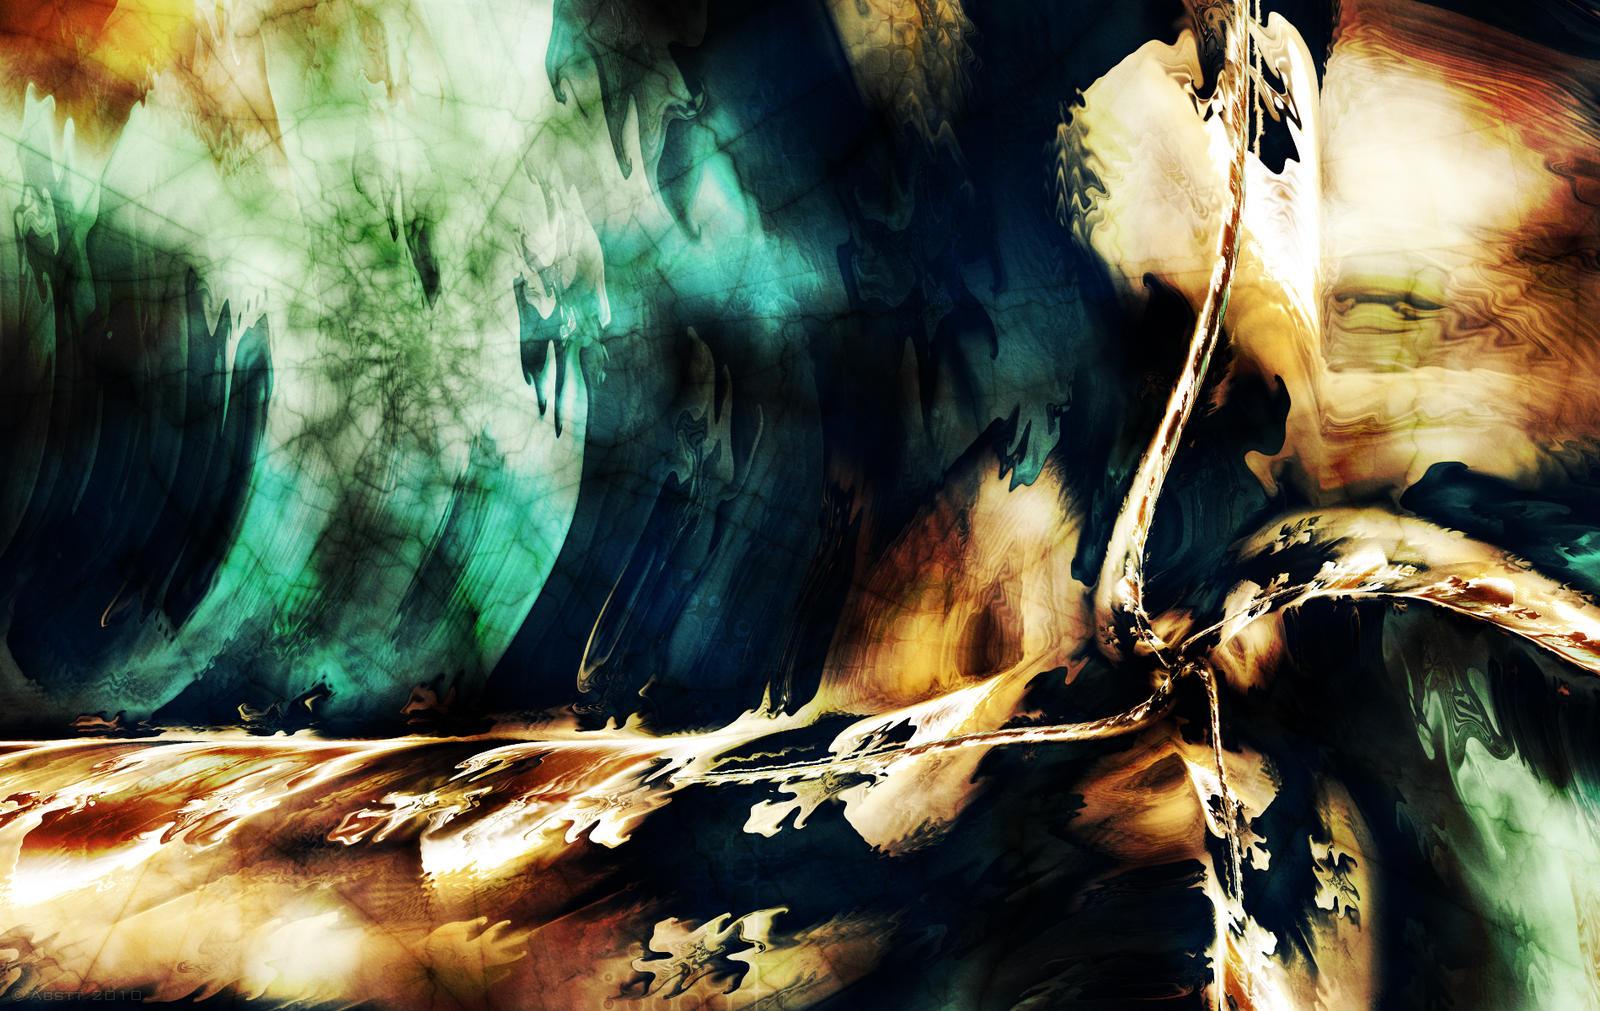 Darkness is beautiful by Abstt